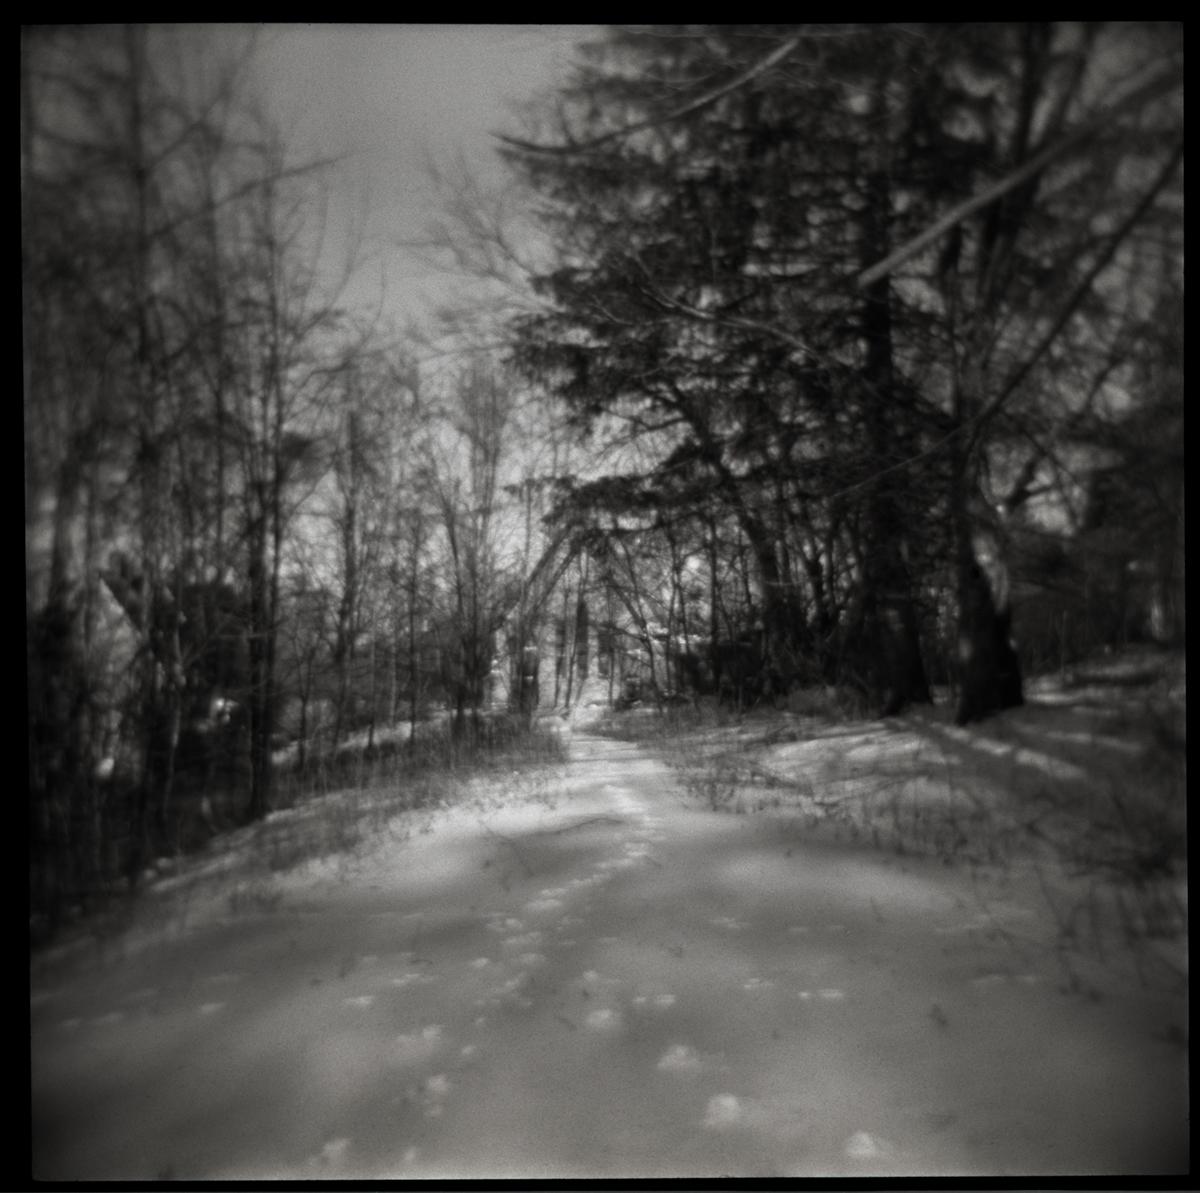 Tracks | Sharon Springs, New York